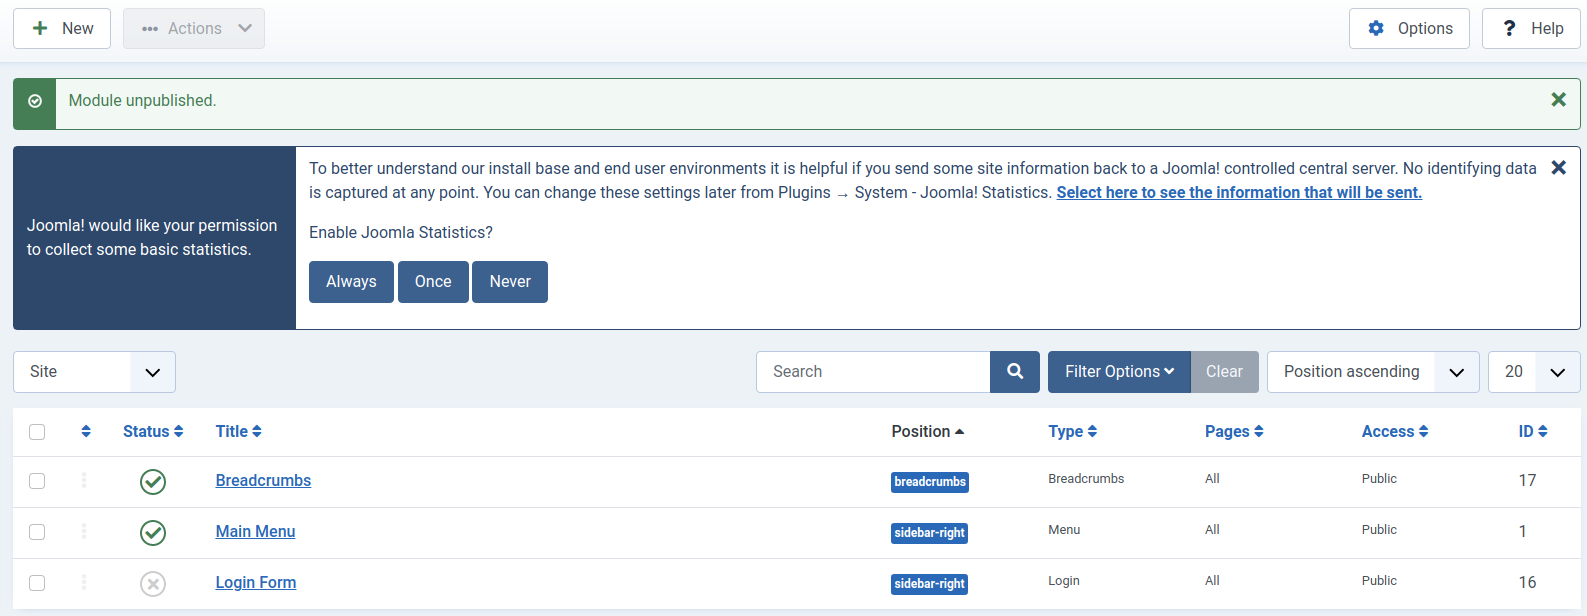 Joomla 4 Login Form Module has been Removed